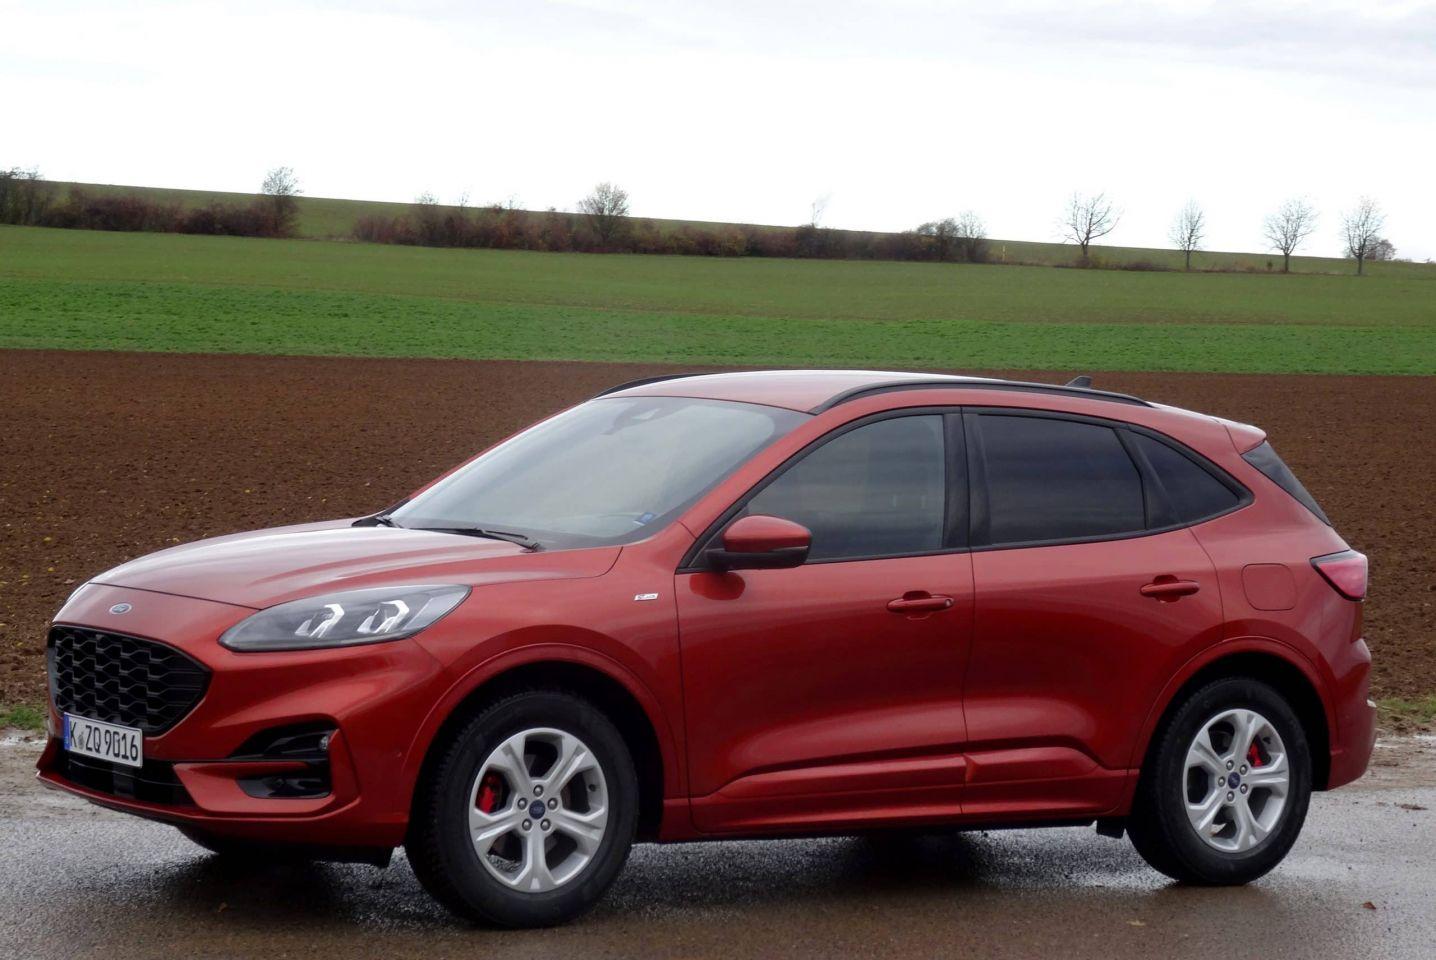 Ford Kuga 2.0 EcoBlue: Dieselmotor, Allradantrieb und Automatik